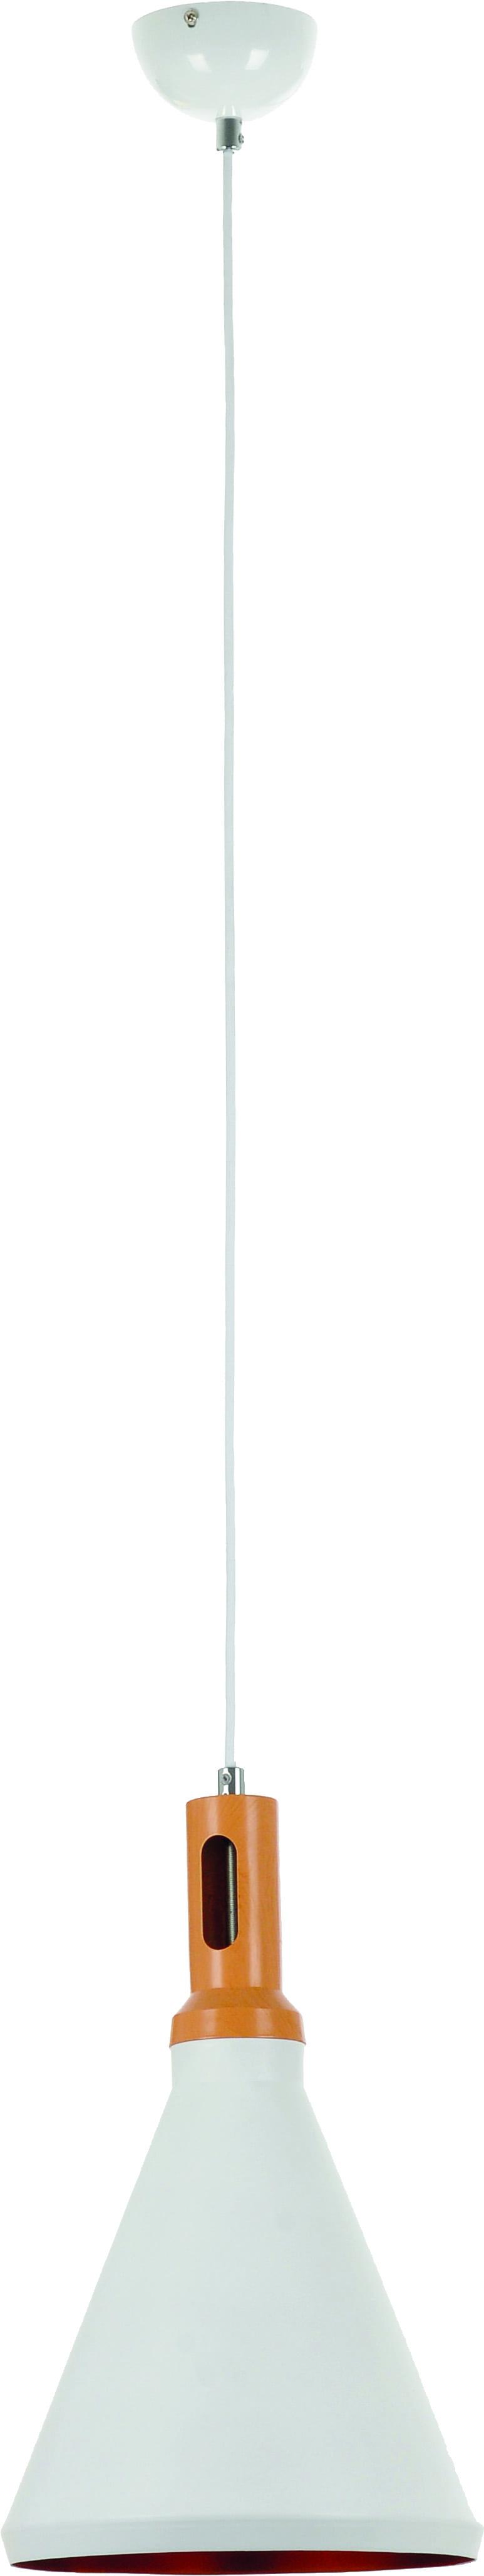 Pendant lamp Selene wood and white 60W